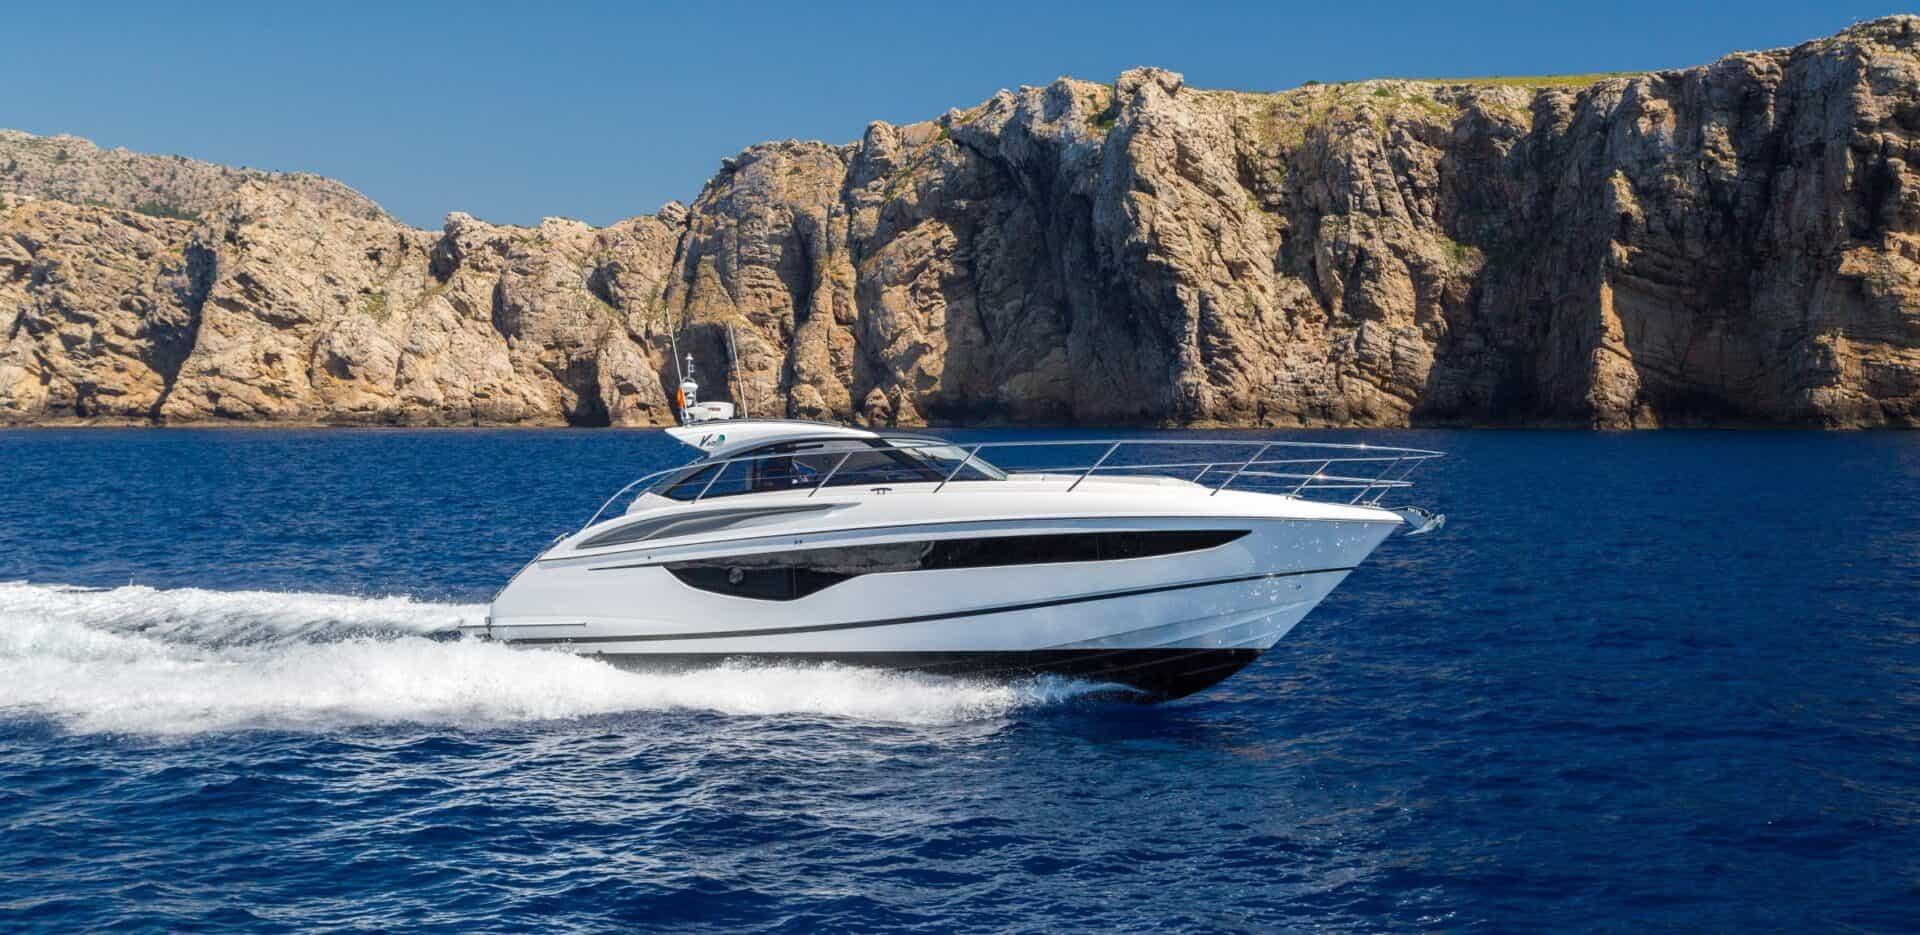 v40-exterior-white-hull-1a-e1604478641618-1920x935